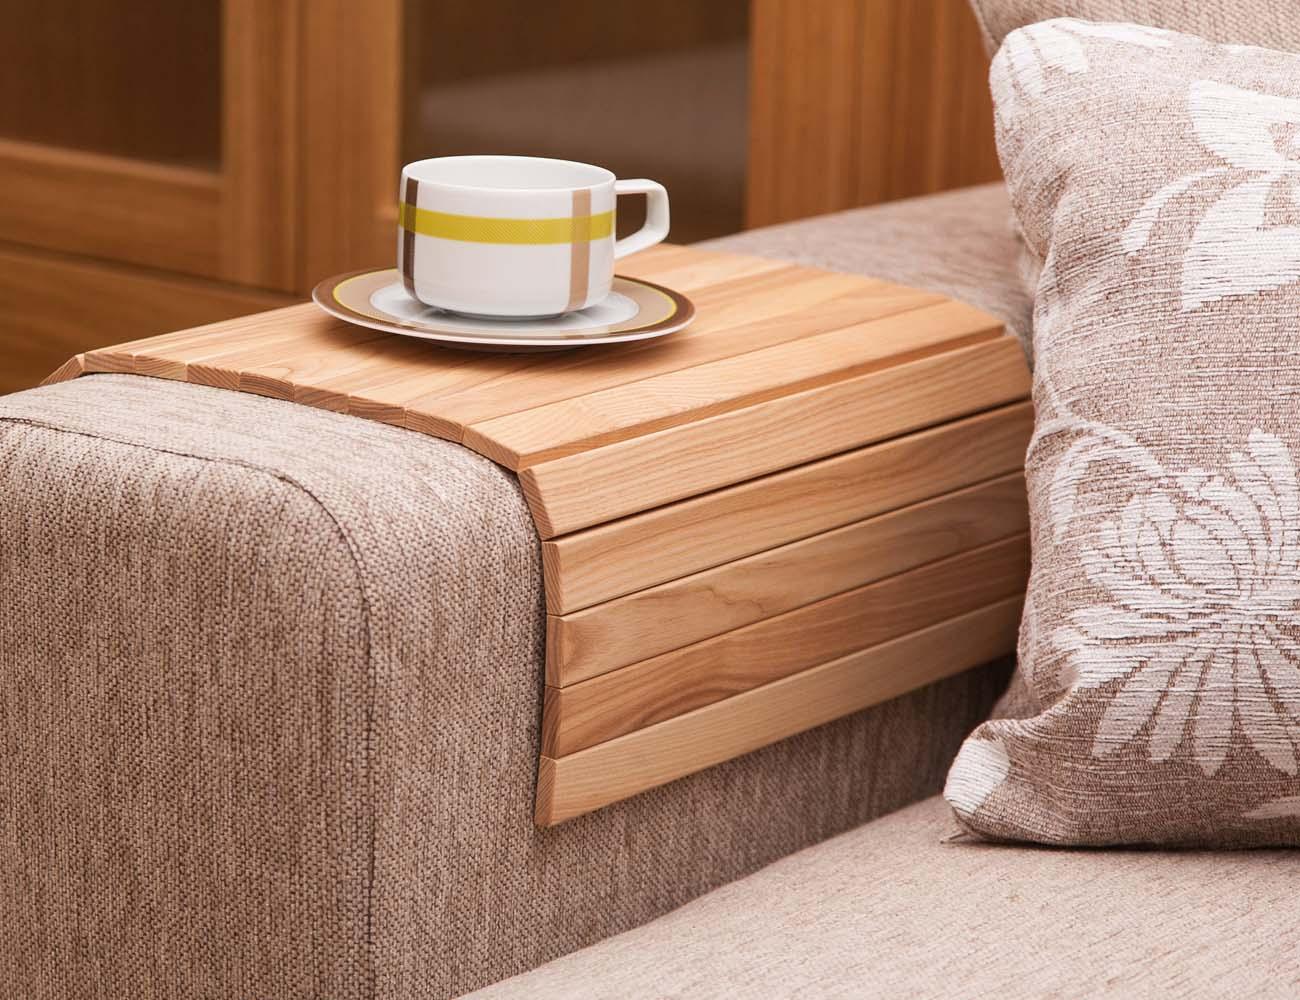 sofa arm rest tray bison cat table slide under